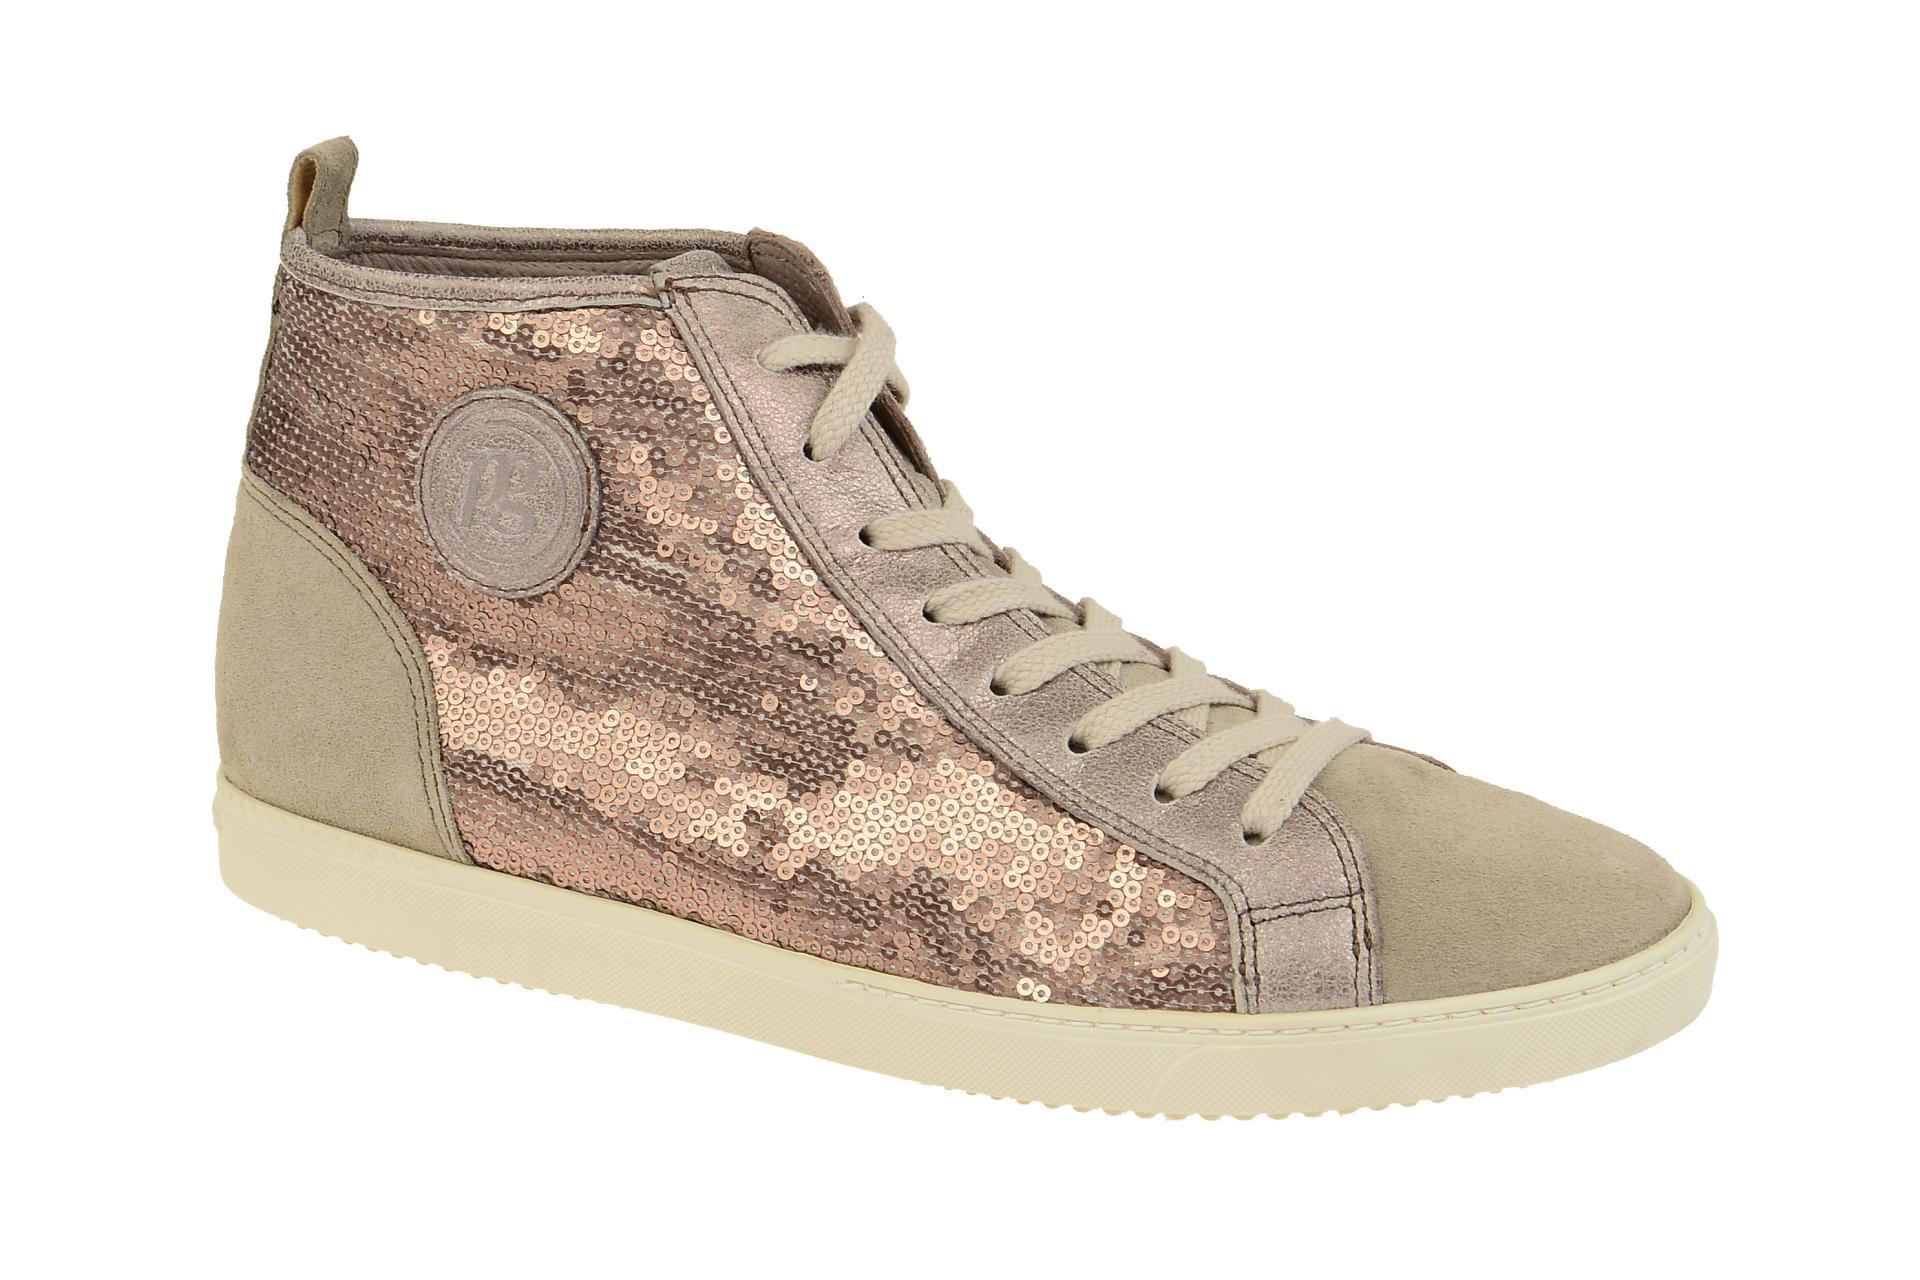 timeless design 6798e 2f284 Paul Green Schuhe beige rose Paillette 4239